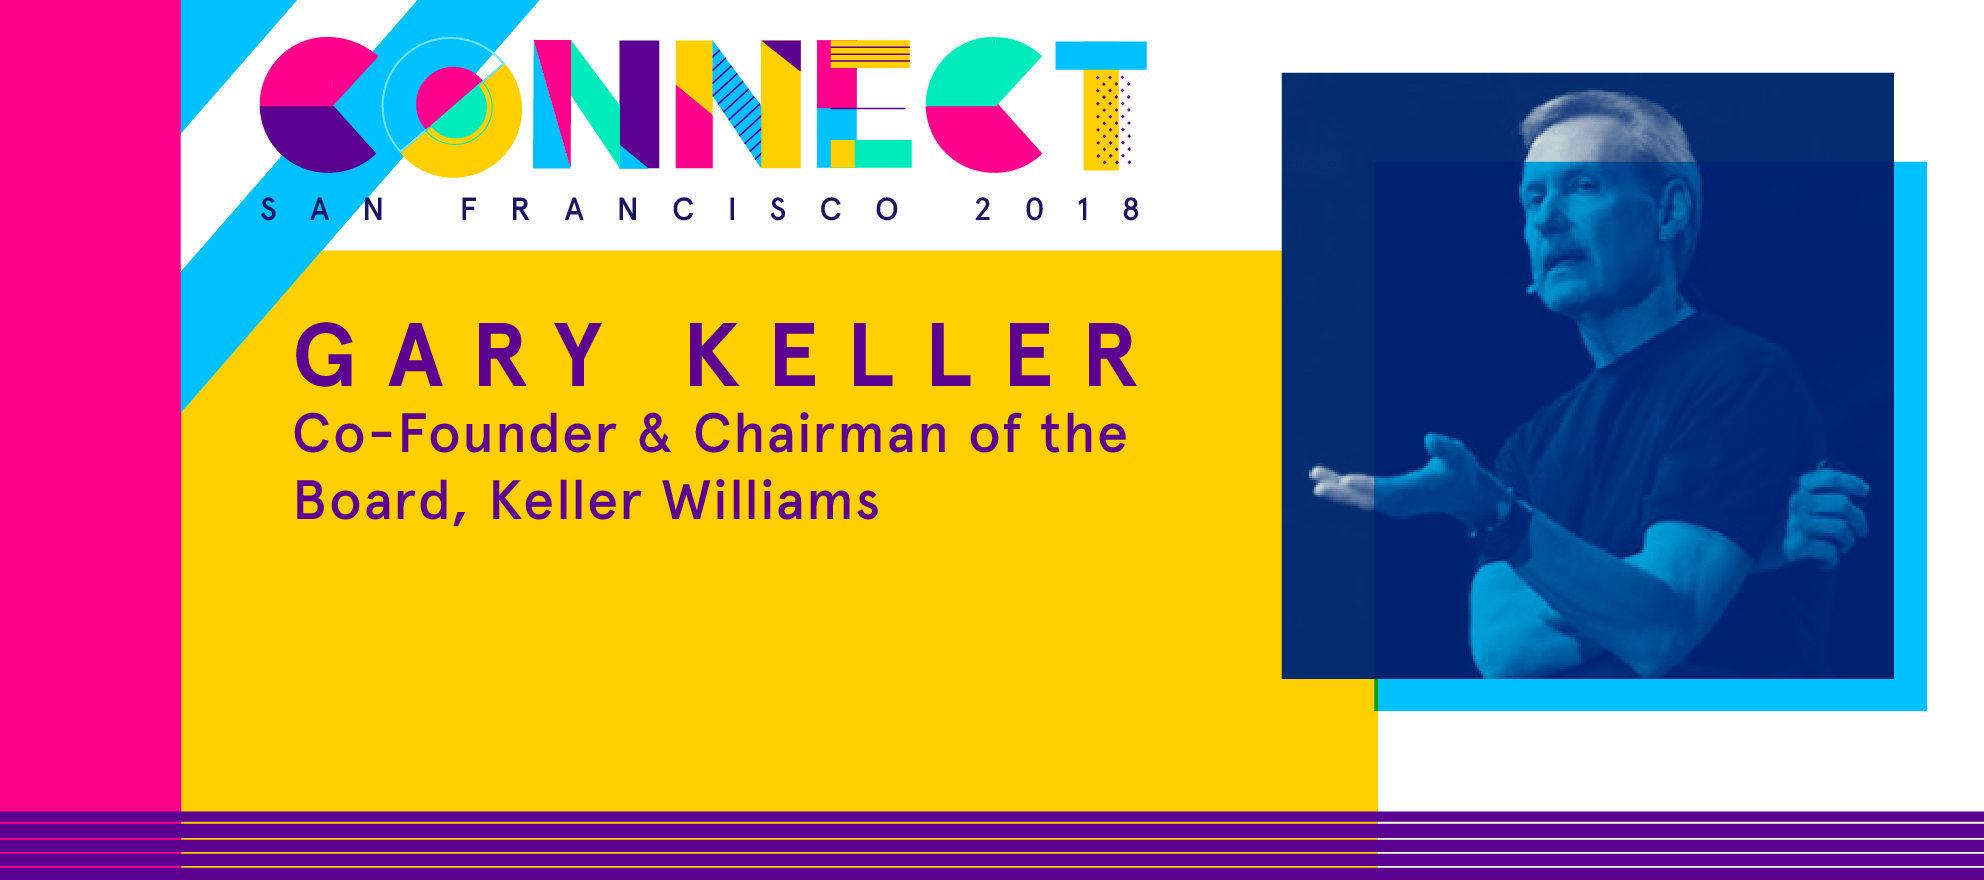 Gary Keller, keynote, ICSF